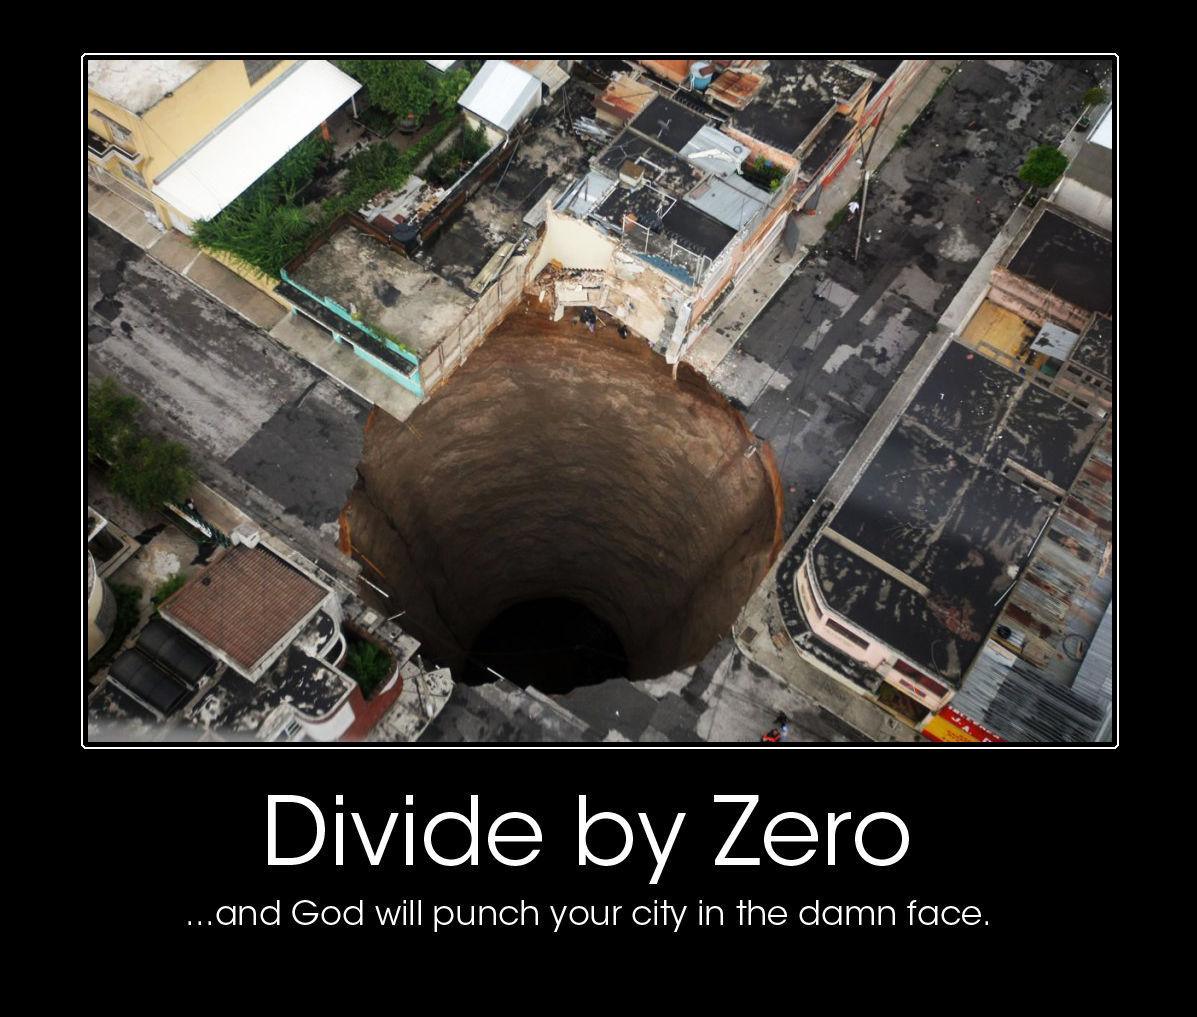 dividexzero.jpg: http://knowyourmeme.com/photos/52822-divide-by-zero